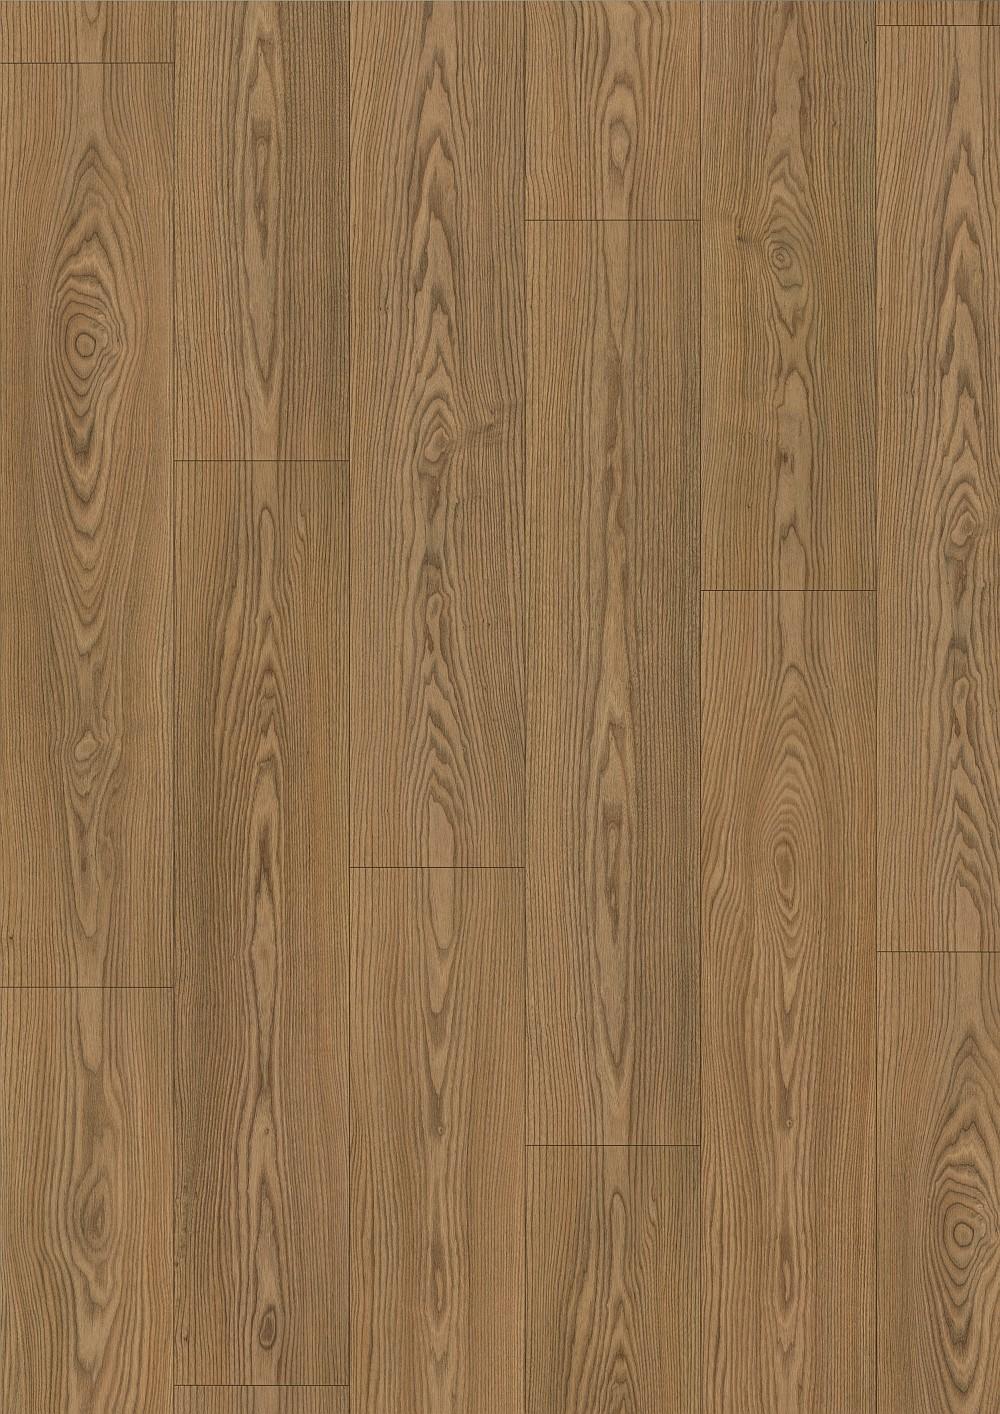 Korková plovoucí podlaha EGGER Cork+ Large (Jasan Weinsberg EGGER CO LA 2012)